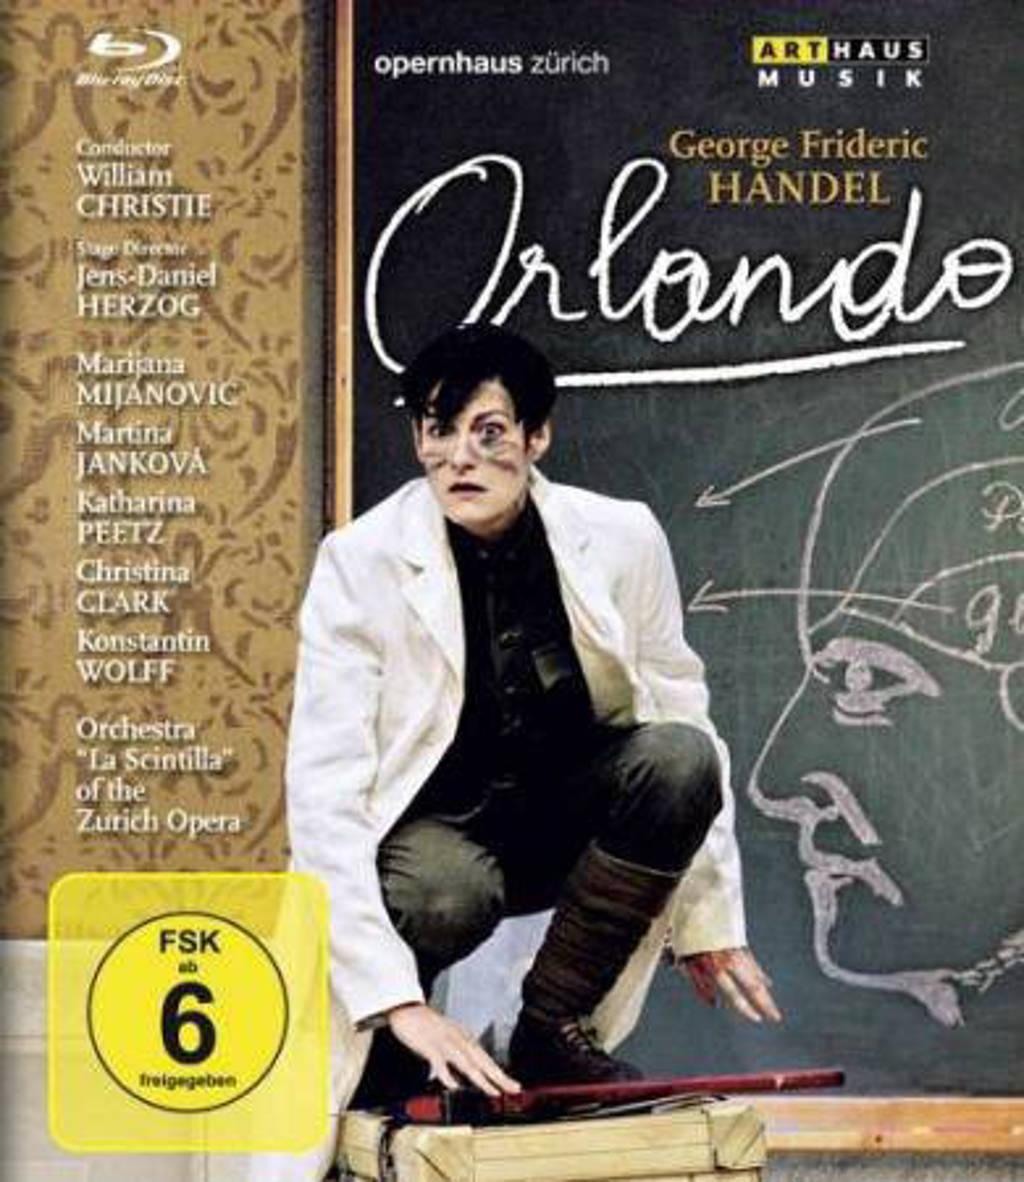 Mijanovic, Jankova,Peetz,Clark - Orlando Zurich 2007 (Blu-ray)